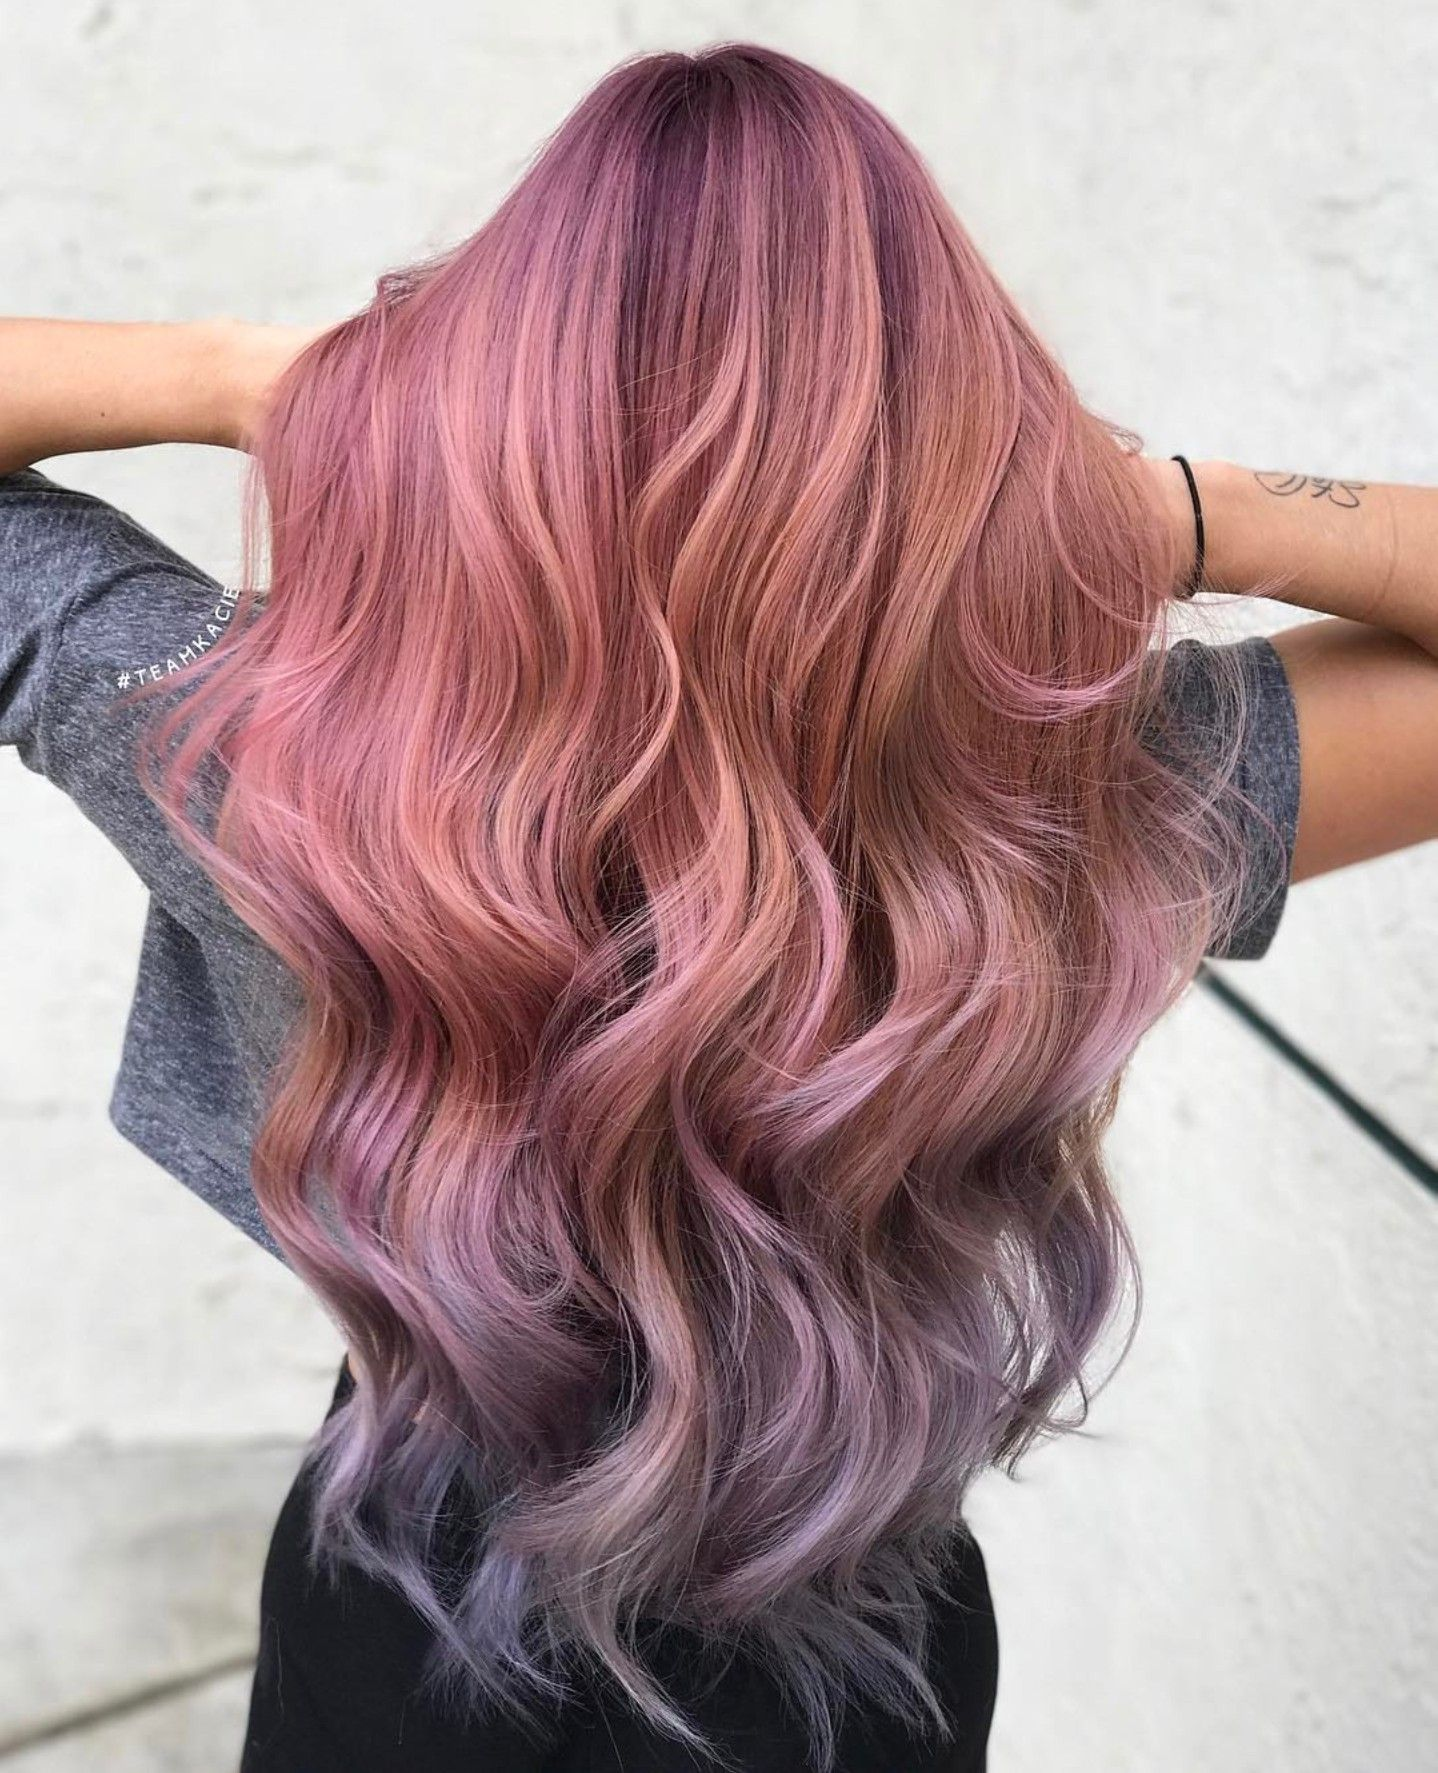 Pin by christina watt on Favorites In Hair Hair care